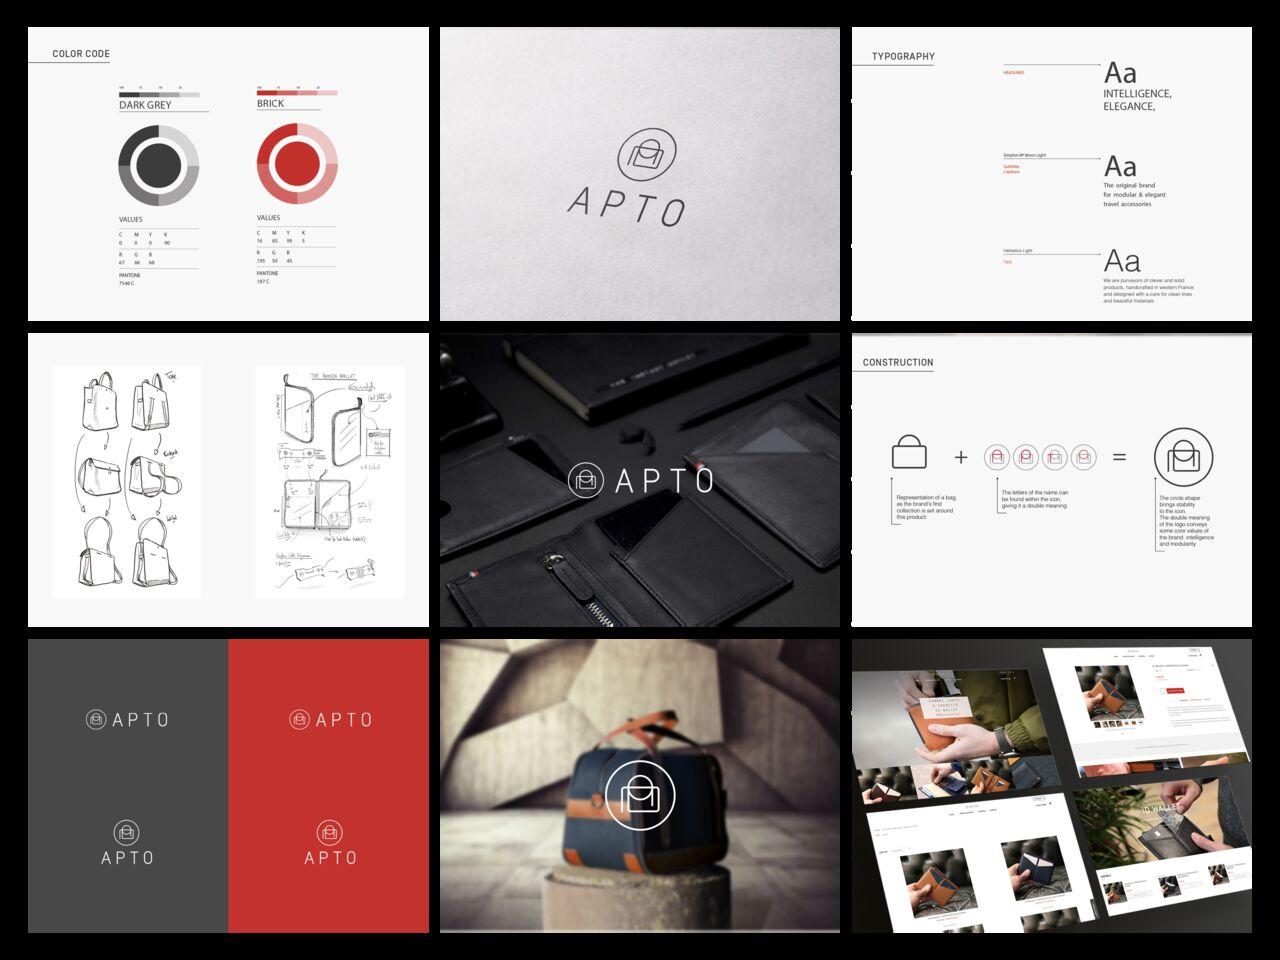 Apto   Branding, Création d'entreprise, WebDesign